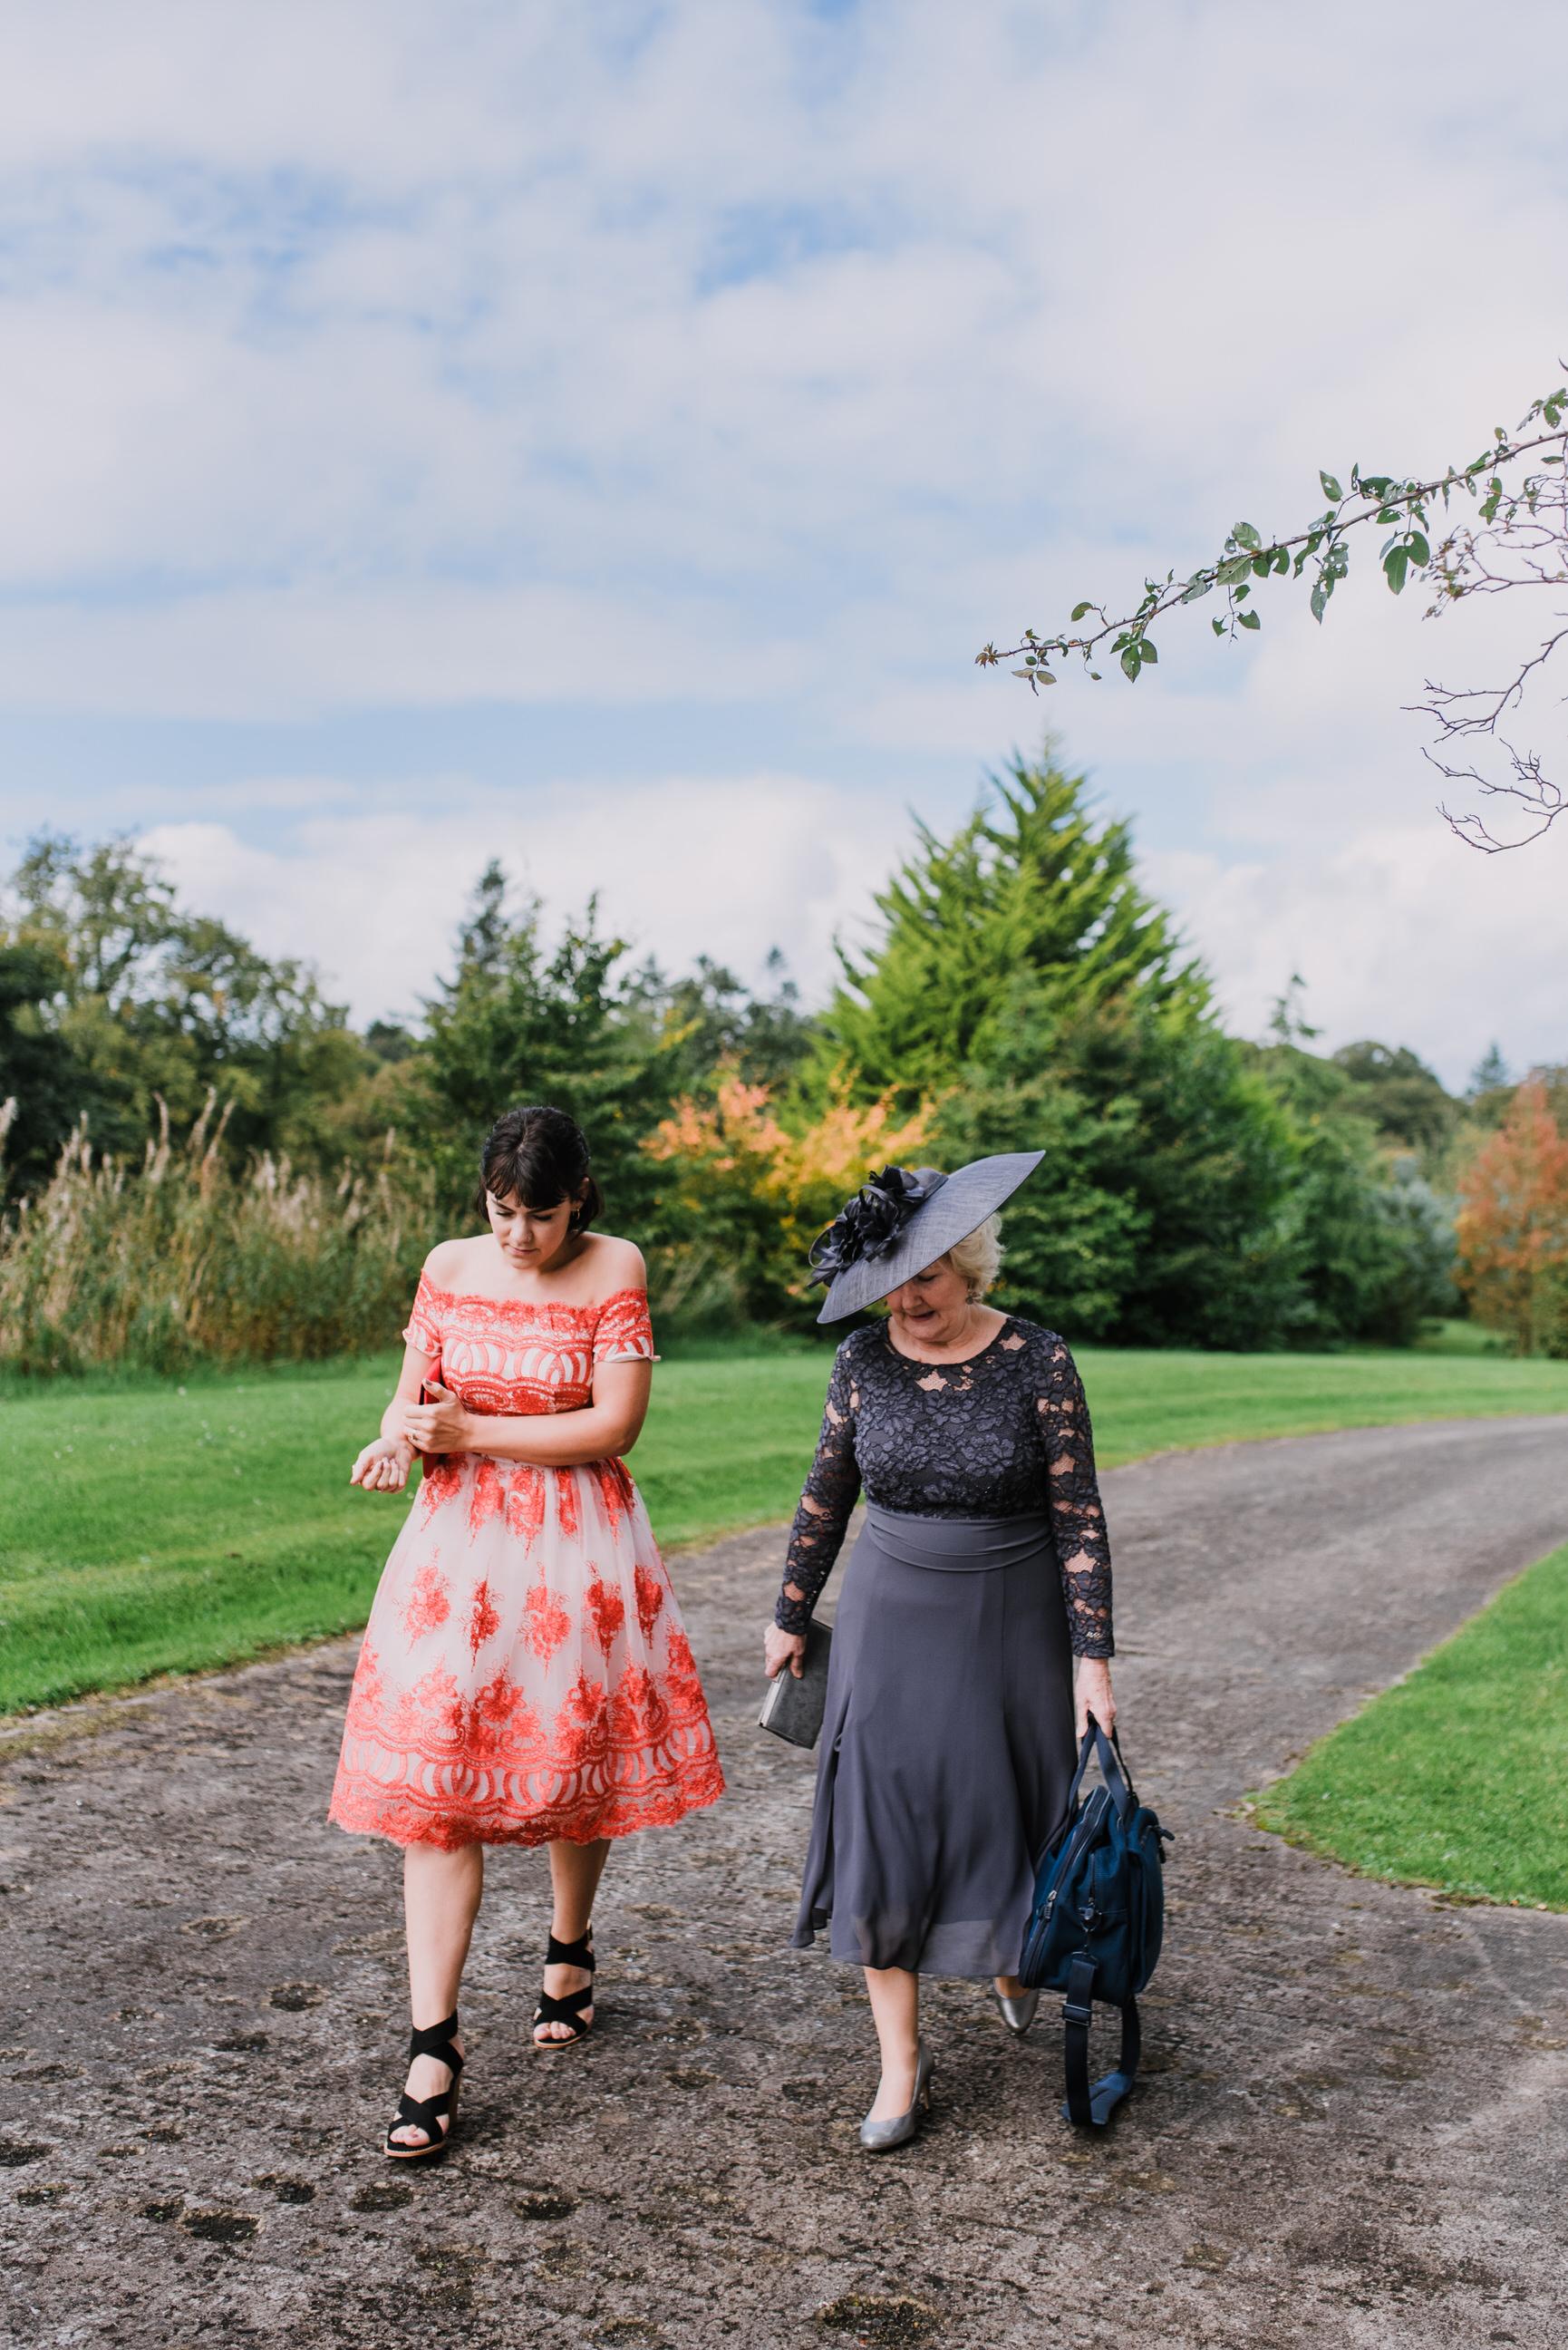 lissanoure castle wedding, northern ireland wedding photographer, romantic northern irish wedding venue, castle wedding ireland, natural wedding photography ni (20).jpg